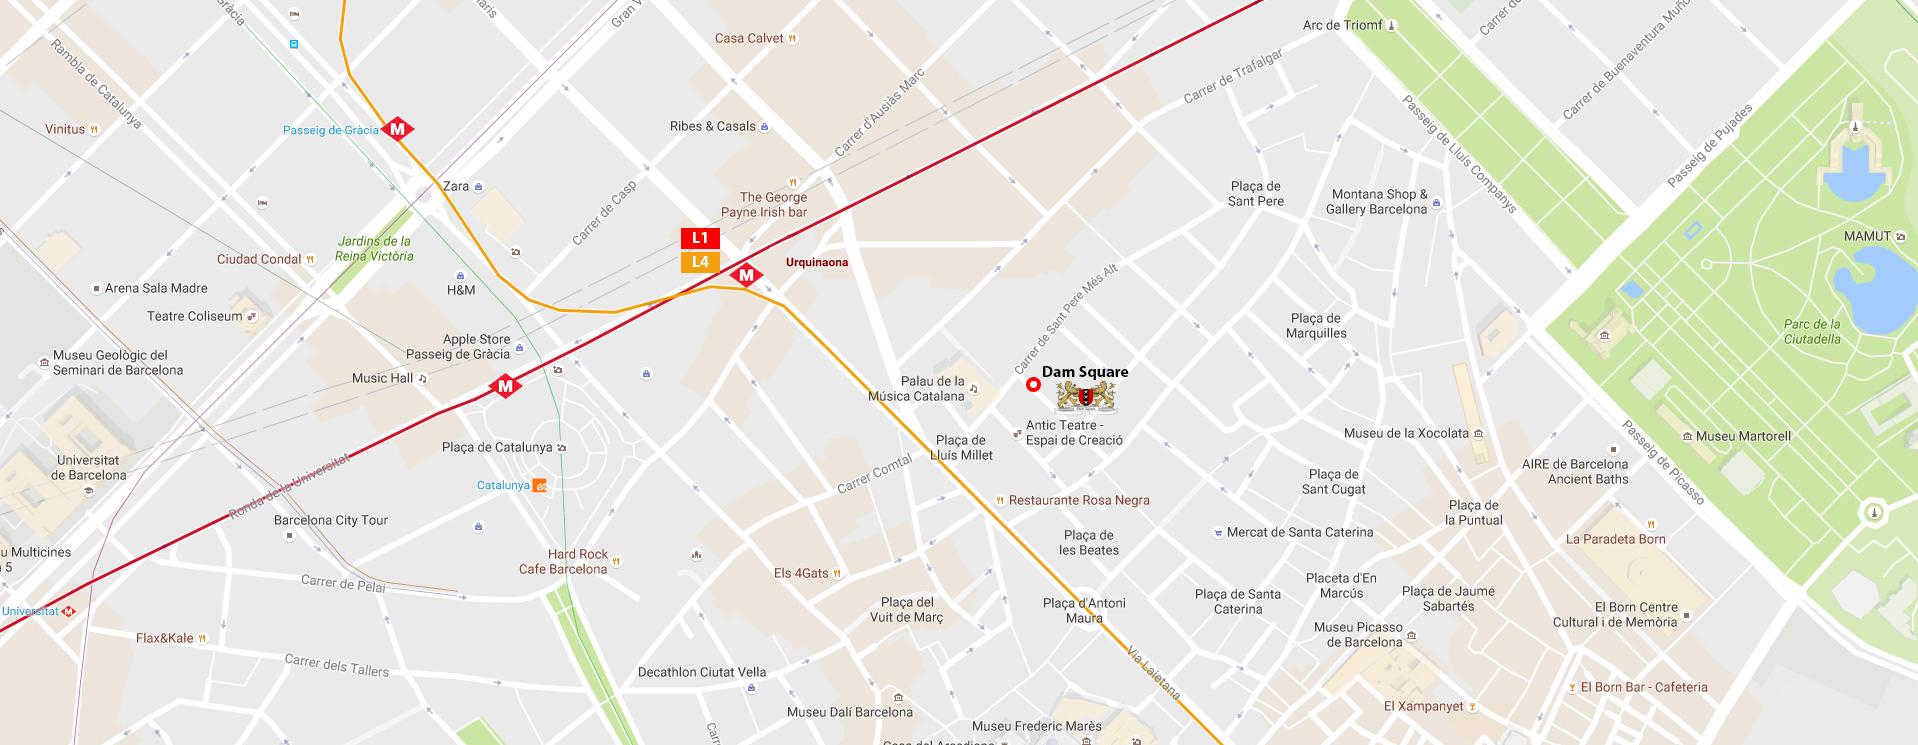 Asociaciones Cannabicas Barcelona Mapa.Dam Square Barcelona Accb Association Cannabis Club